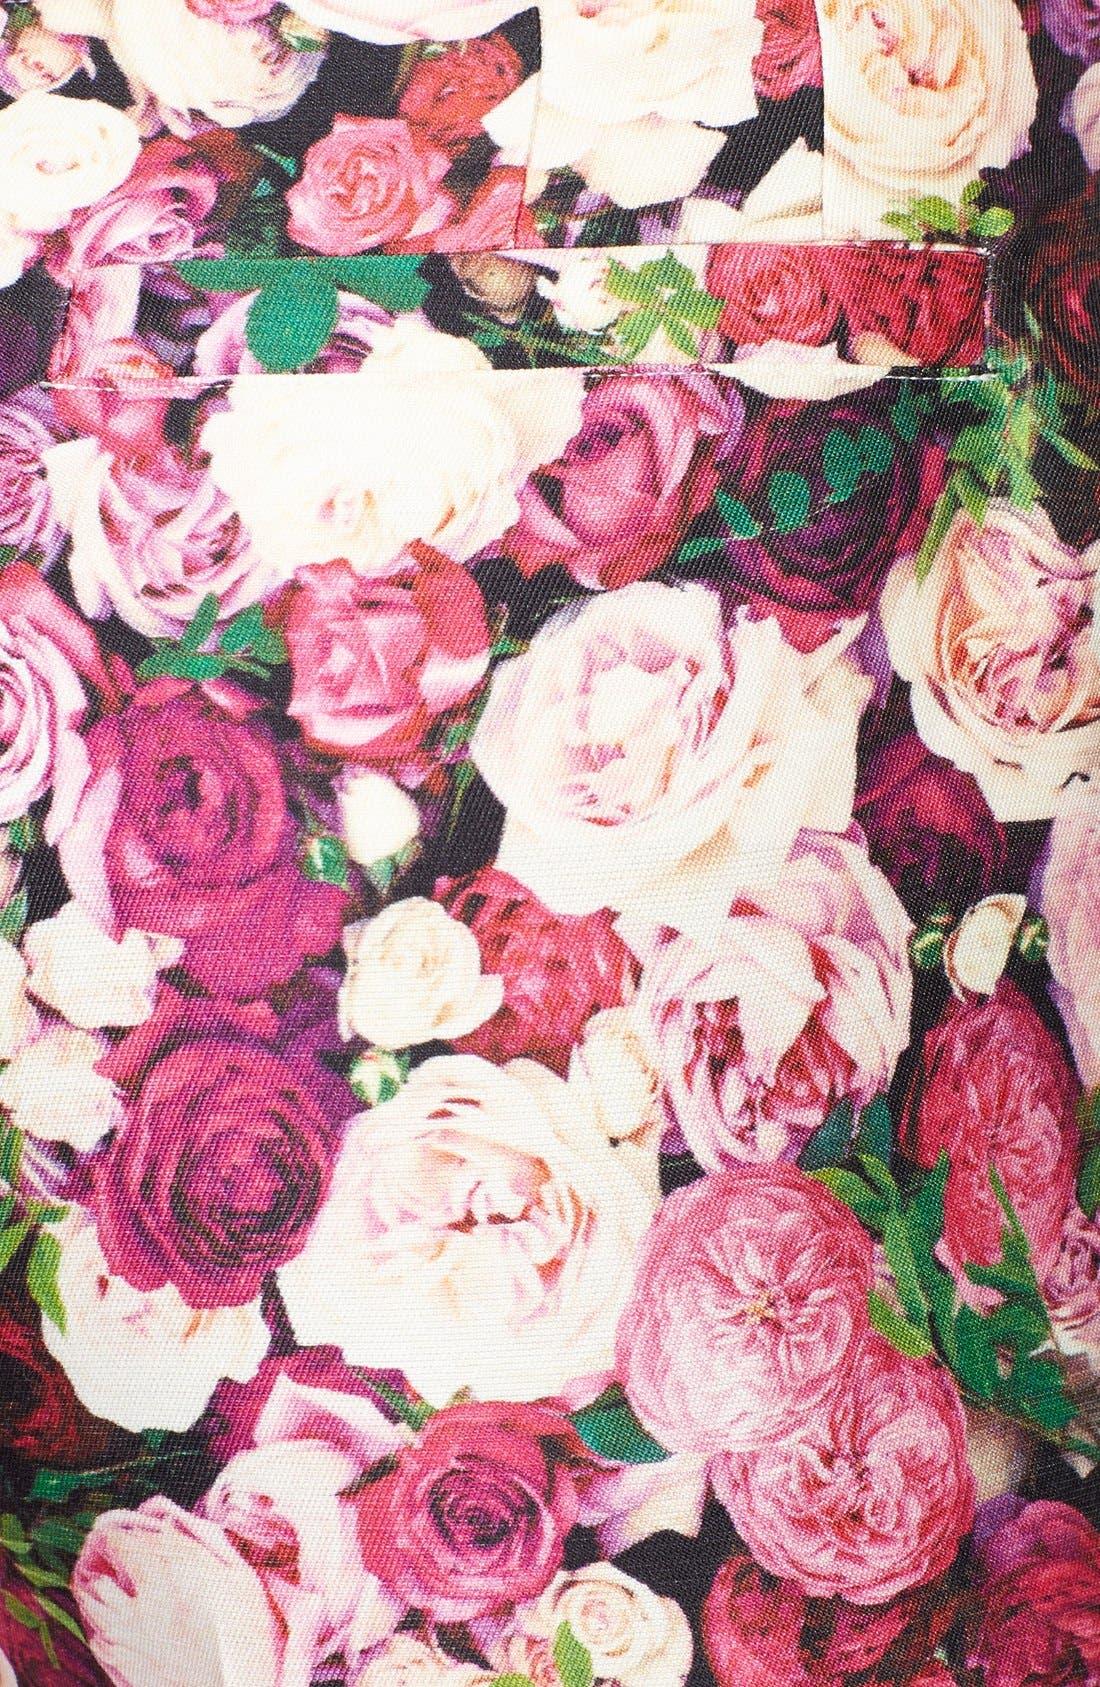 KATE SPADE NEW YORK,                             'jackie' rose print cotton & silk capri pants,                             Alternate thumbnail 3, color,                             655